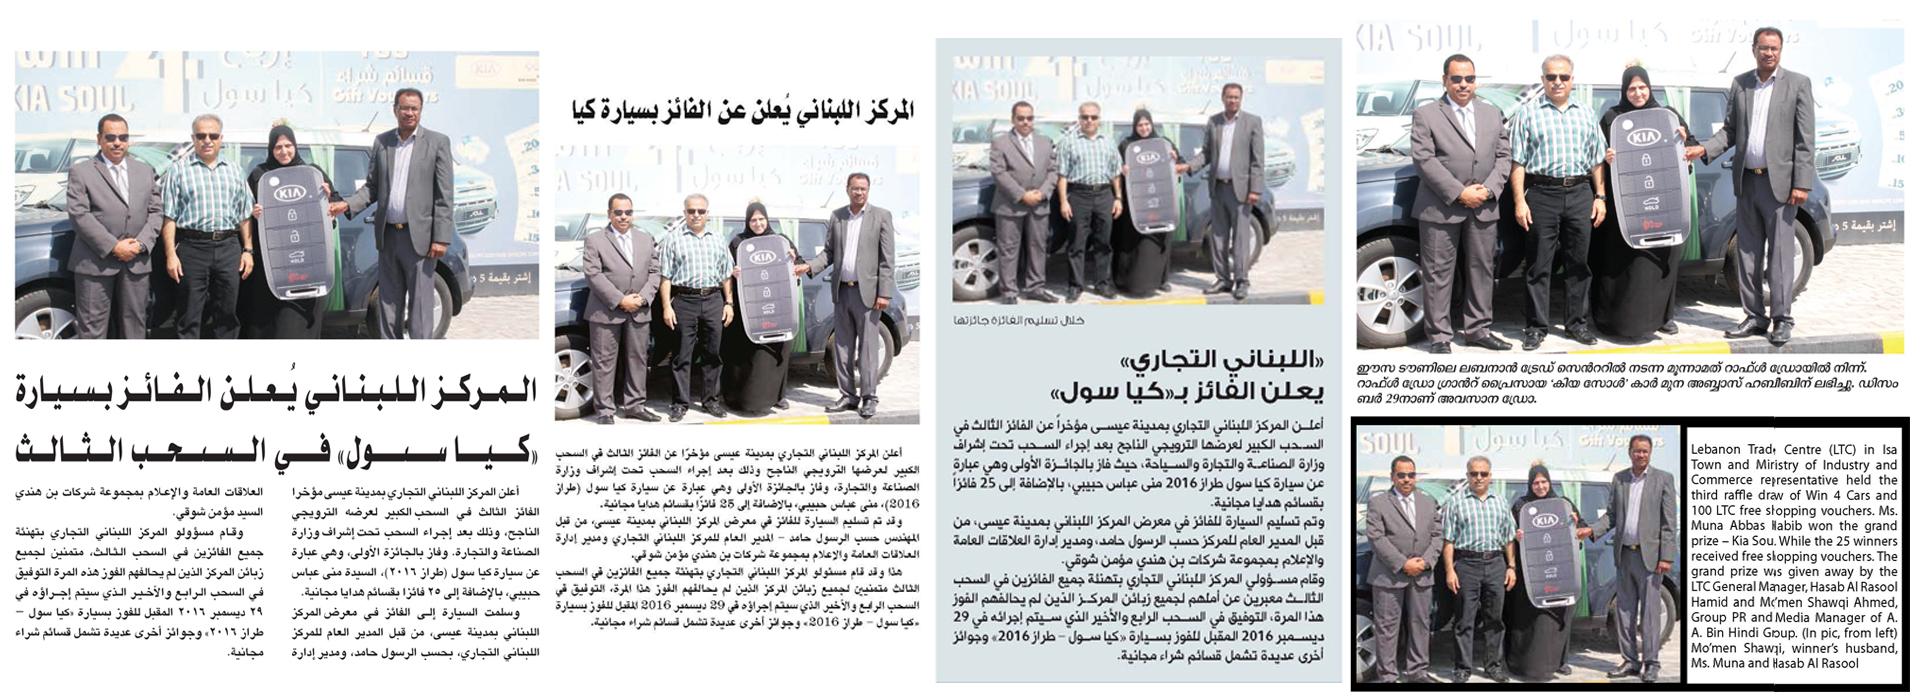 Newspaper press release - October 13 raffle draw winner